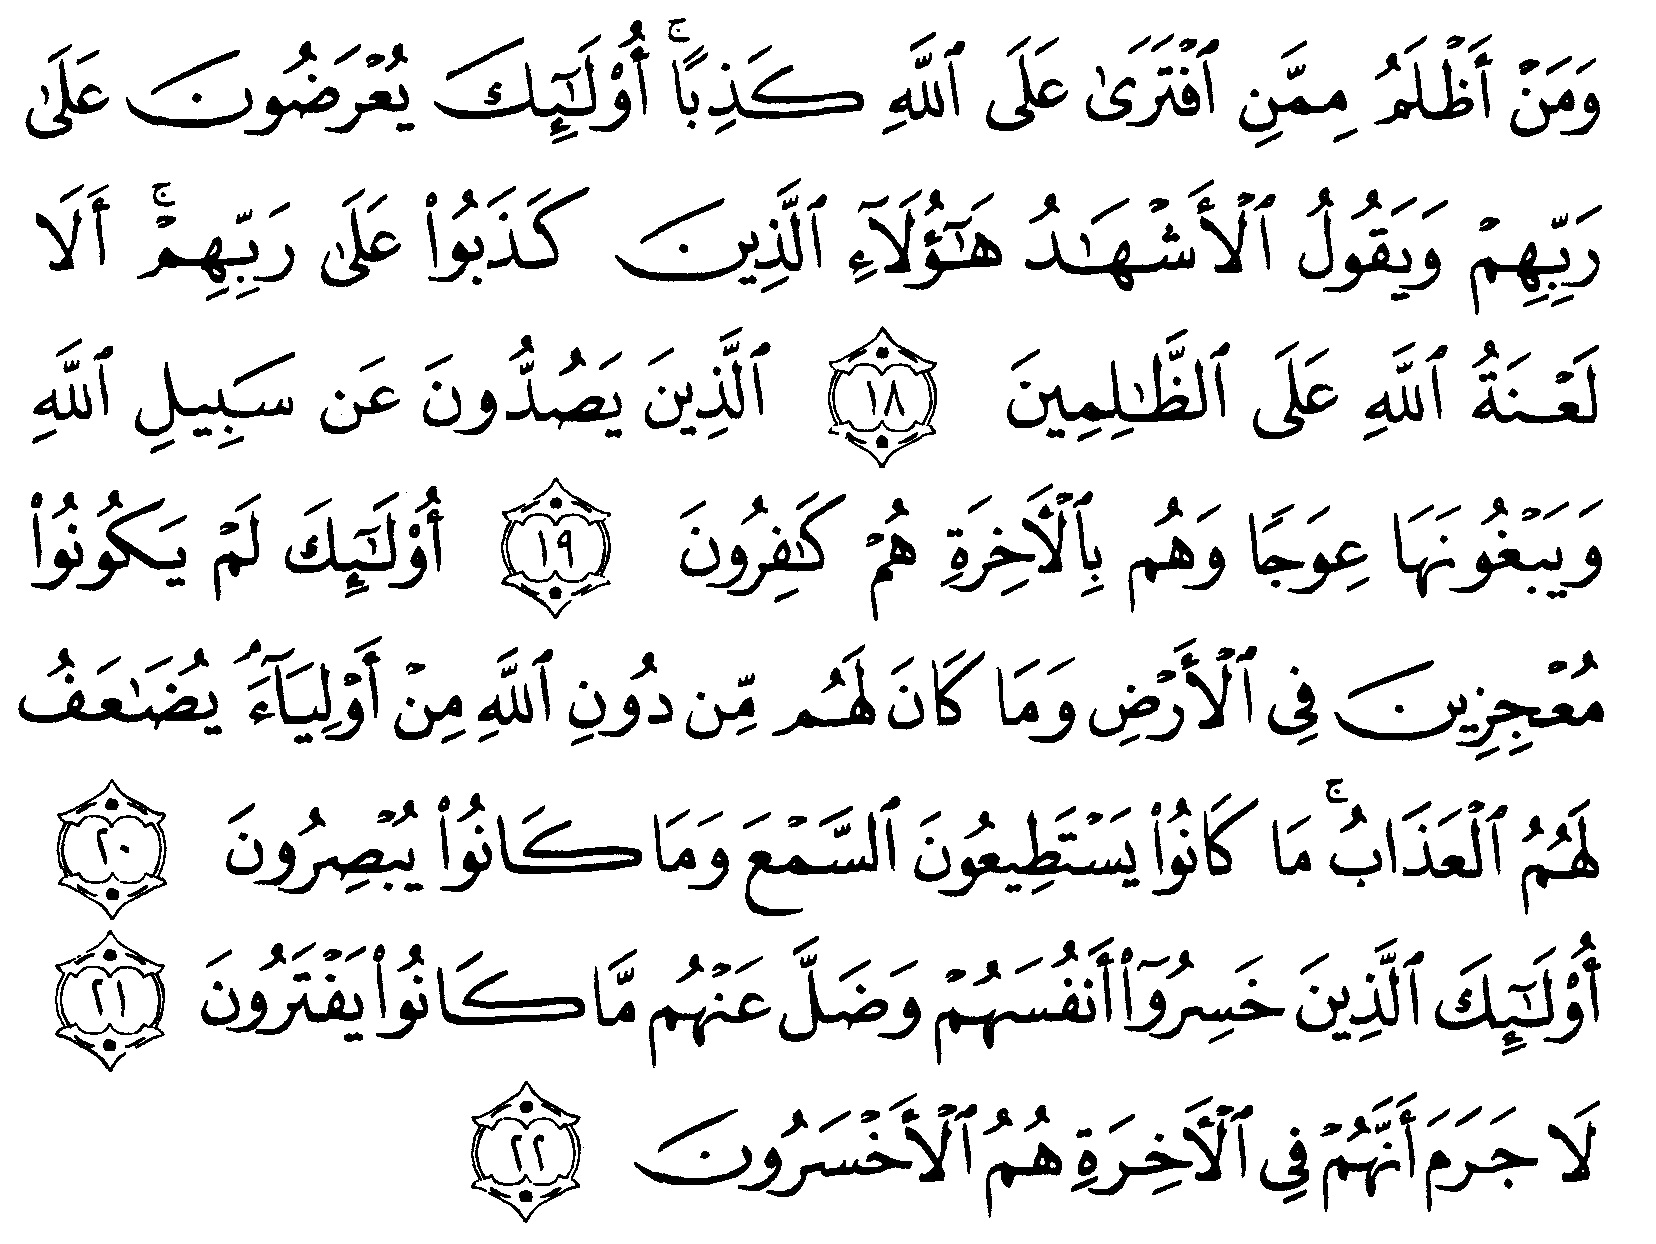 Tafsir Ibnu Katsir Surah Huud Ayat 18 22 Alquranmulia